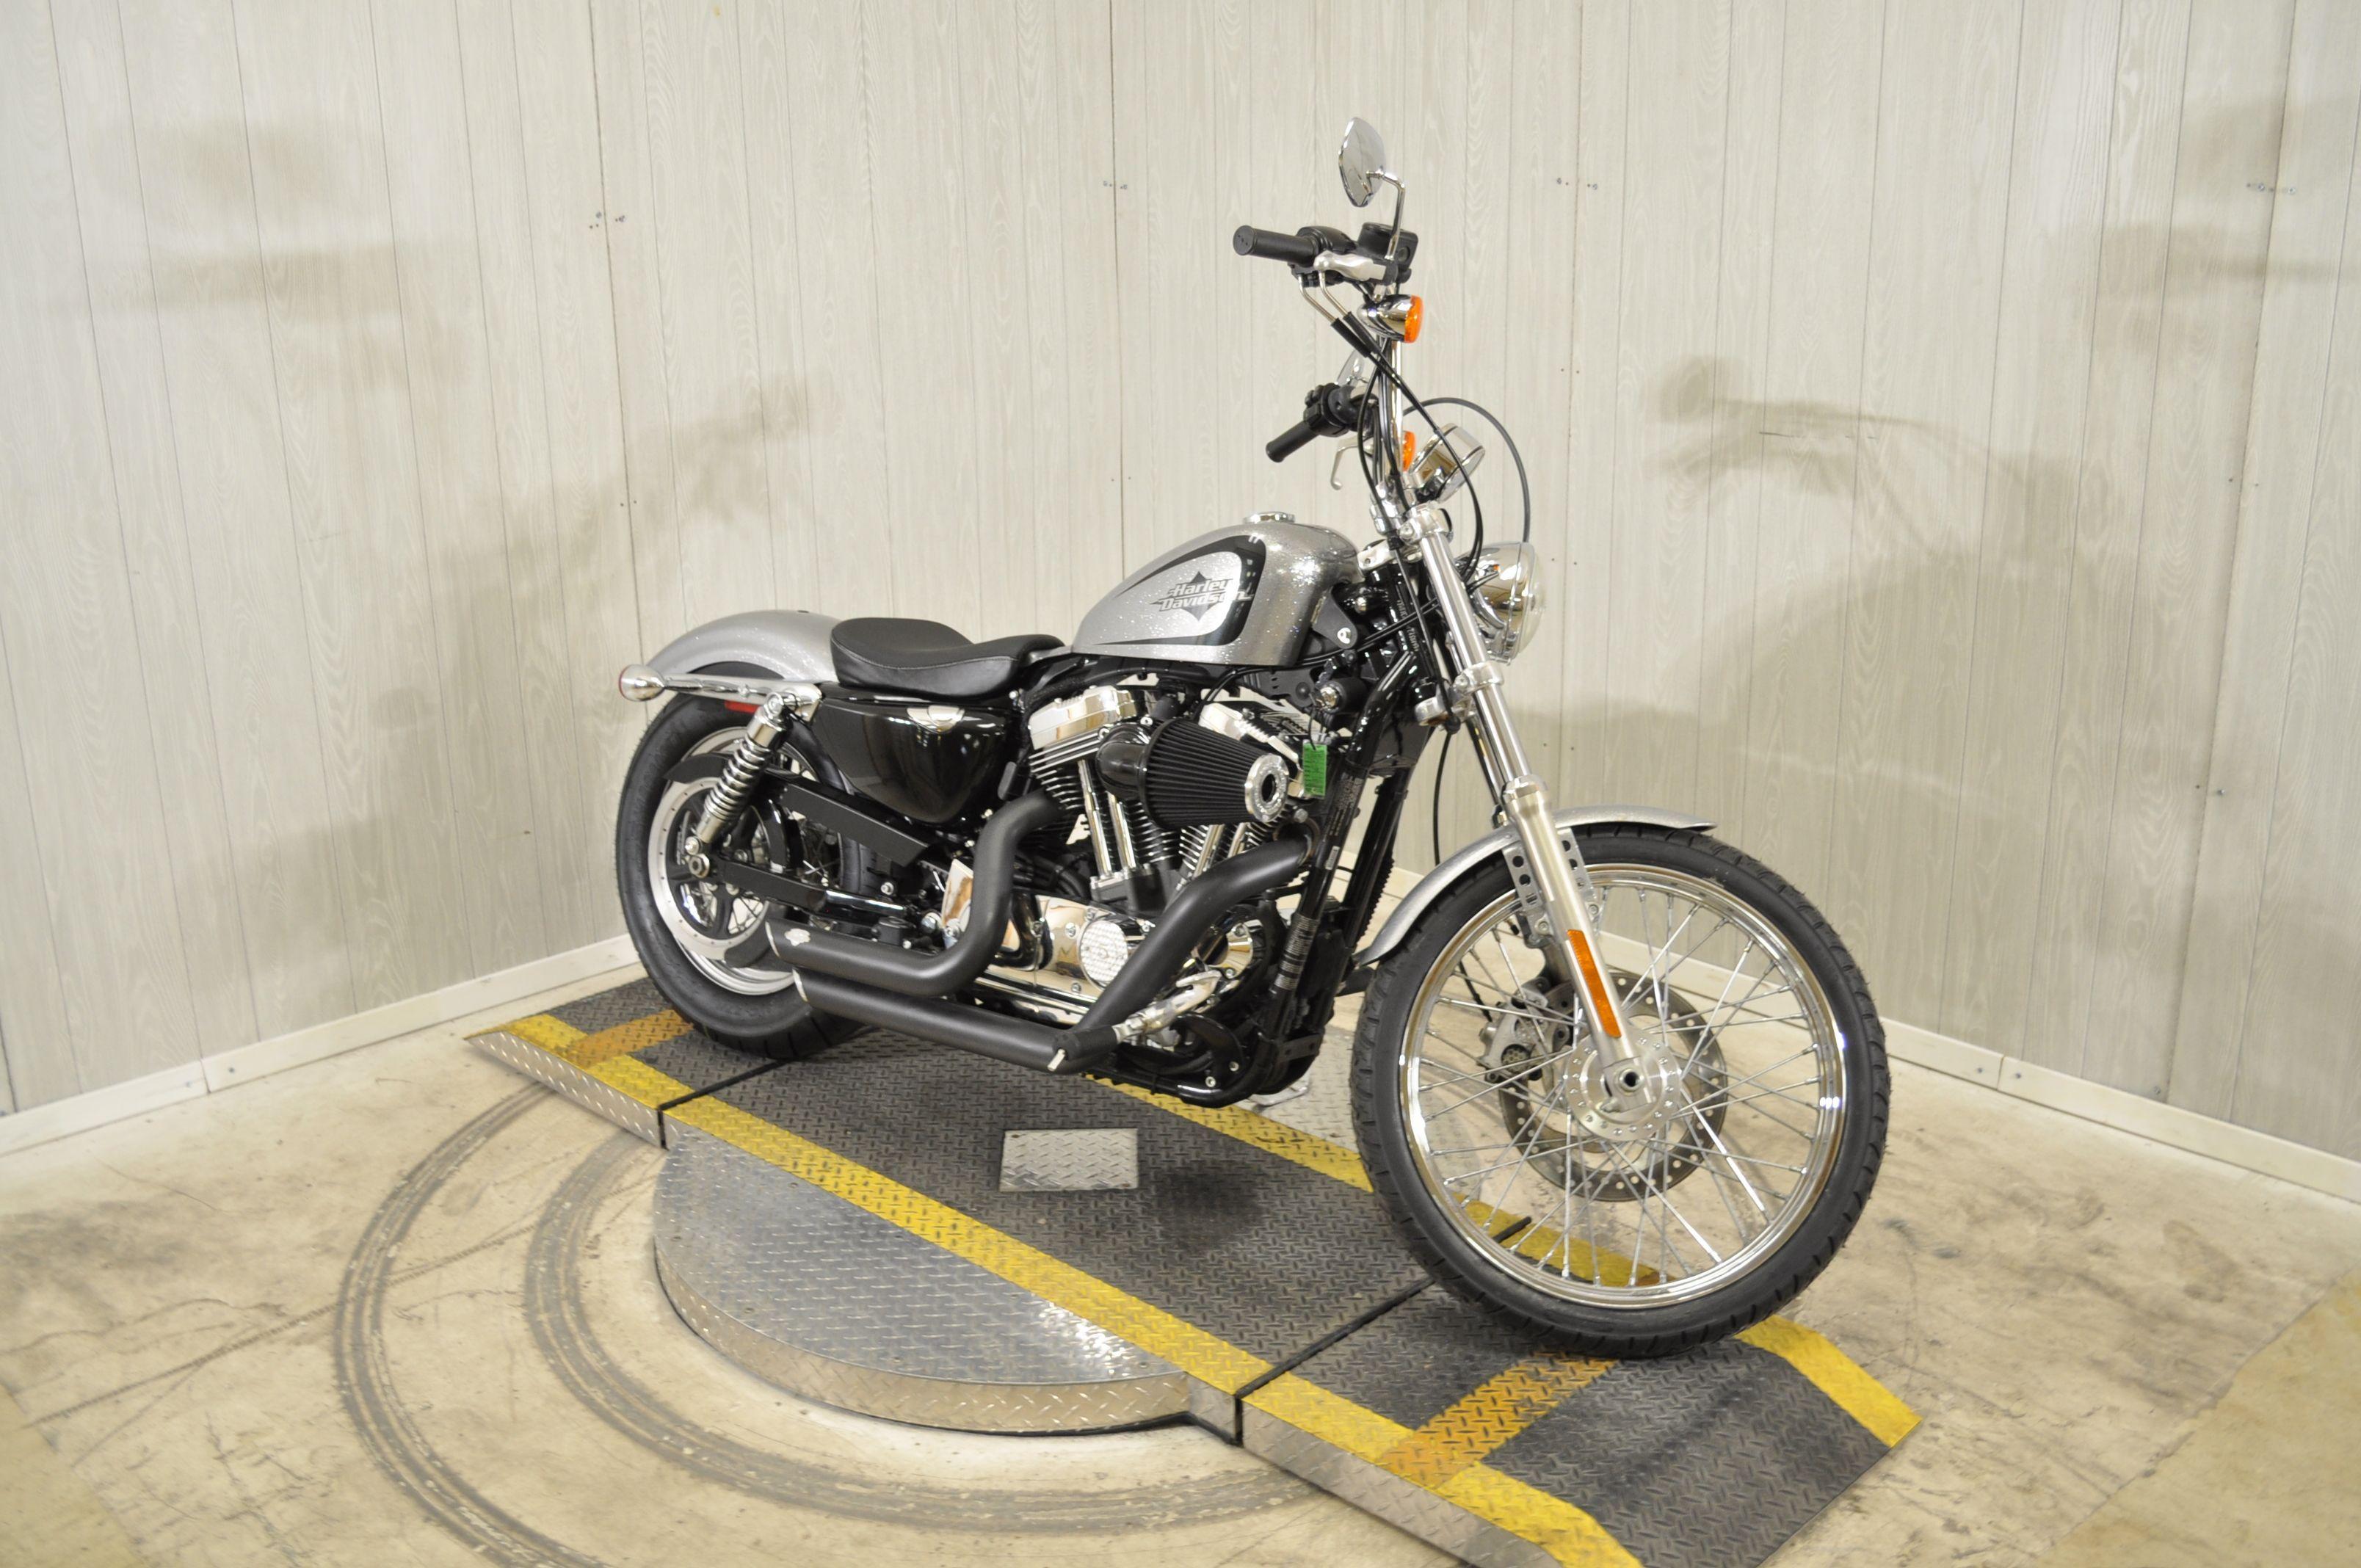 Pre-Owned 2015 Harley-Davidson Seventy-Two XL1200V